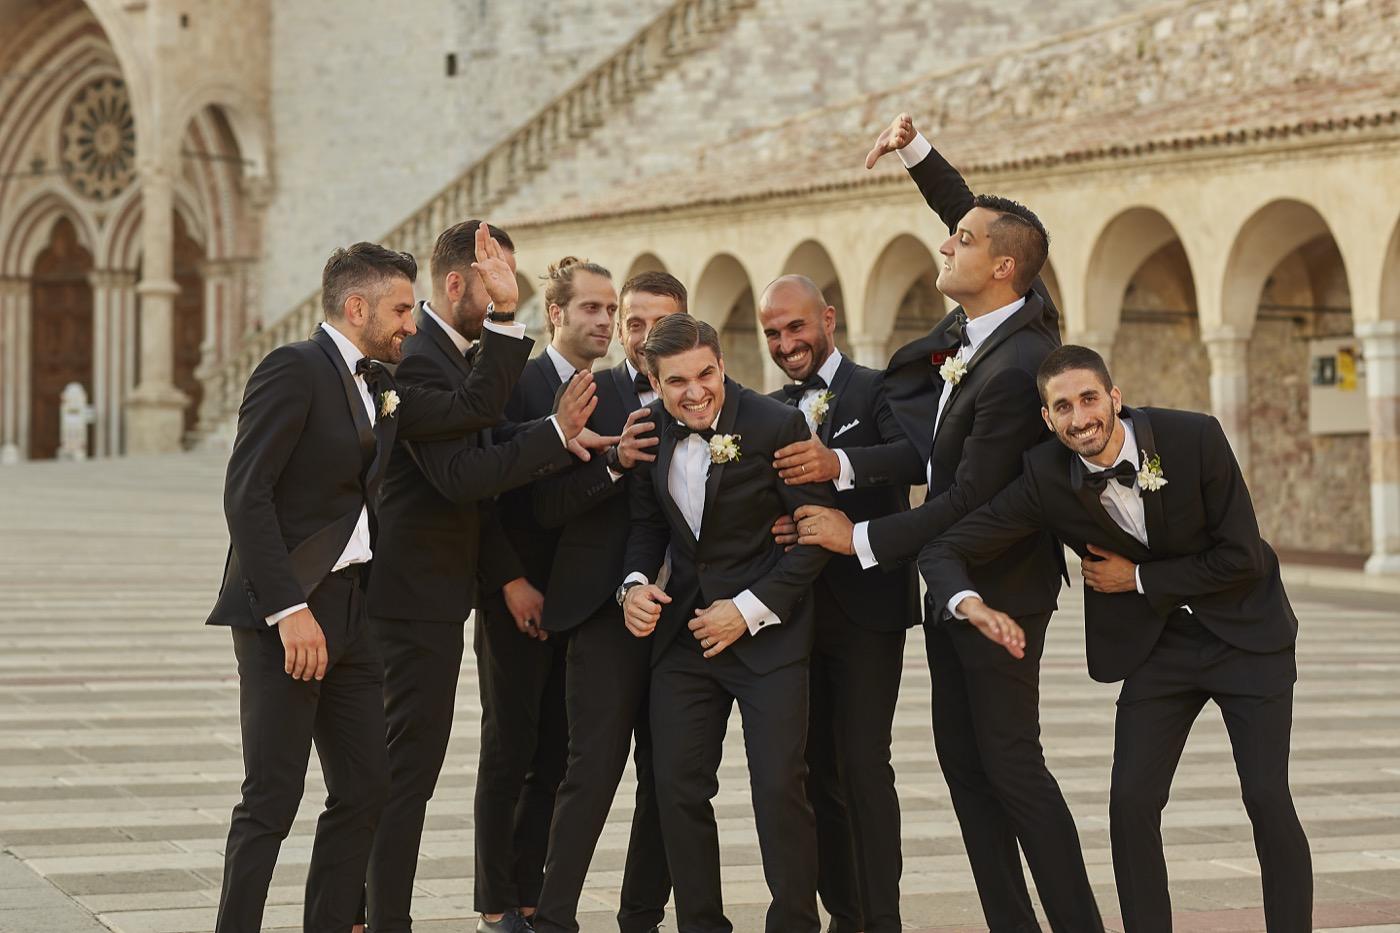 Claudio-Coppola-wedding-photographer-abbazia-7-frati-piegaro-80